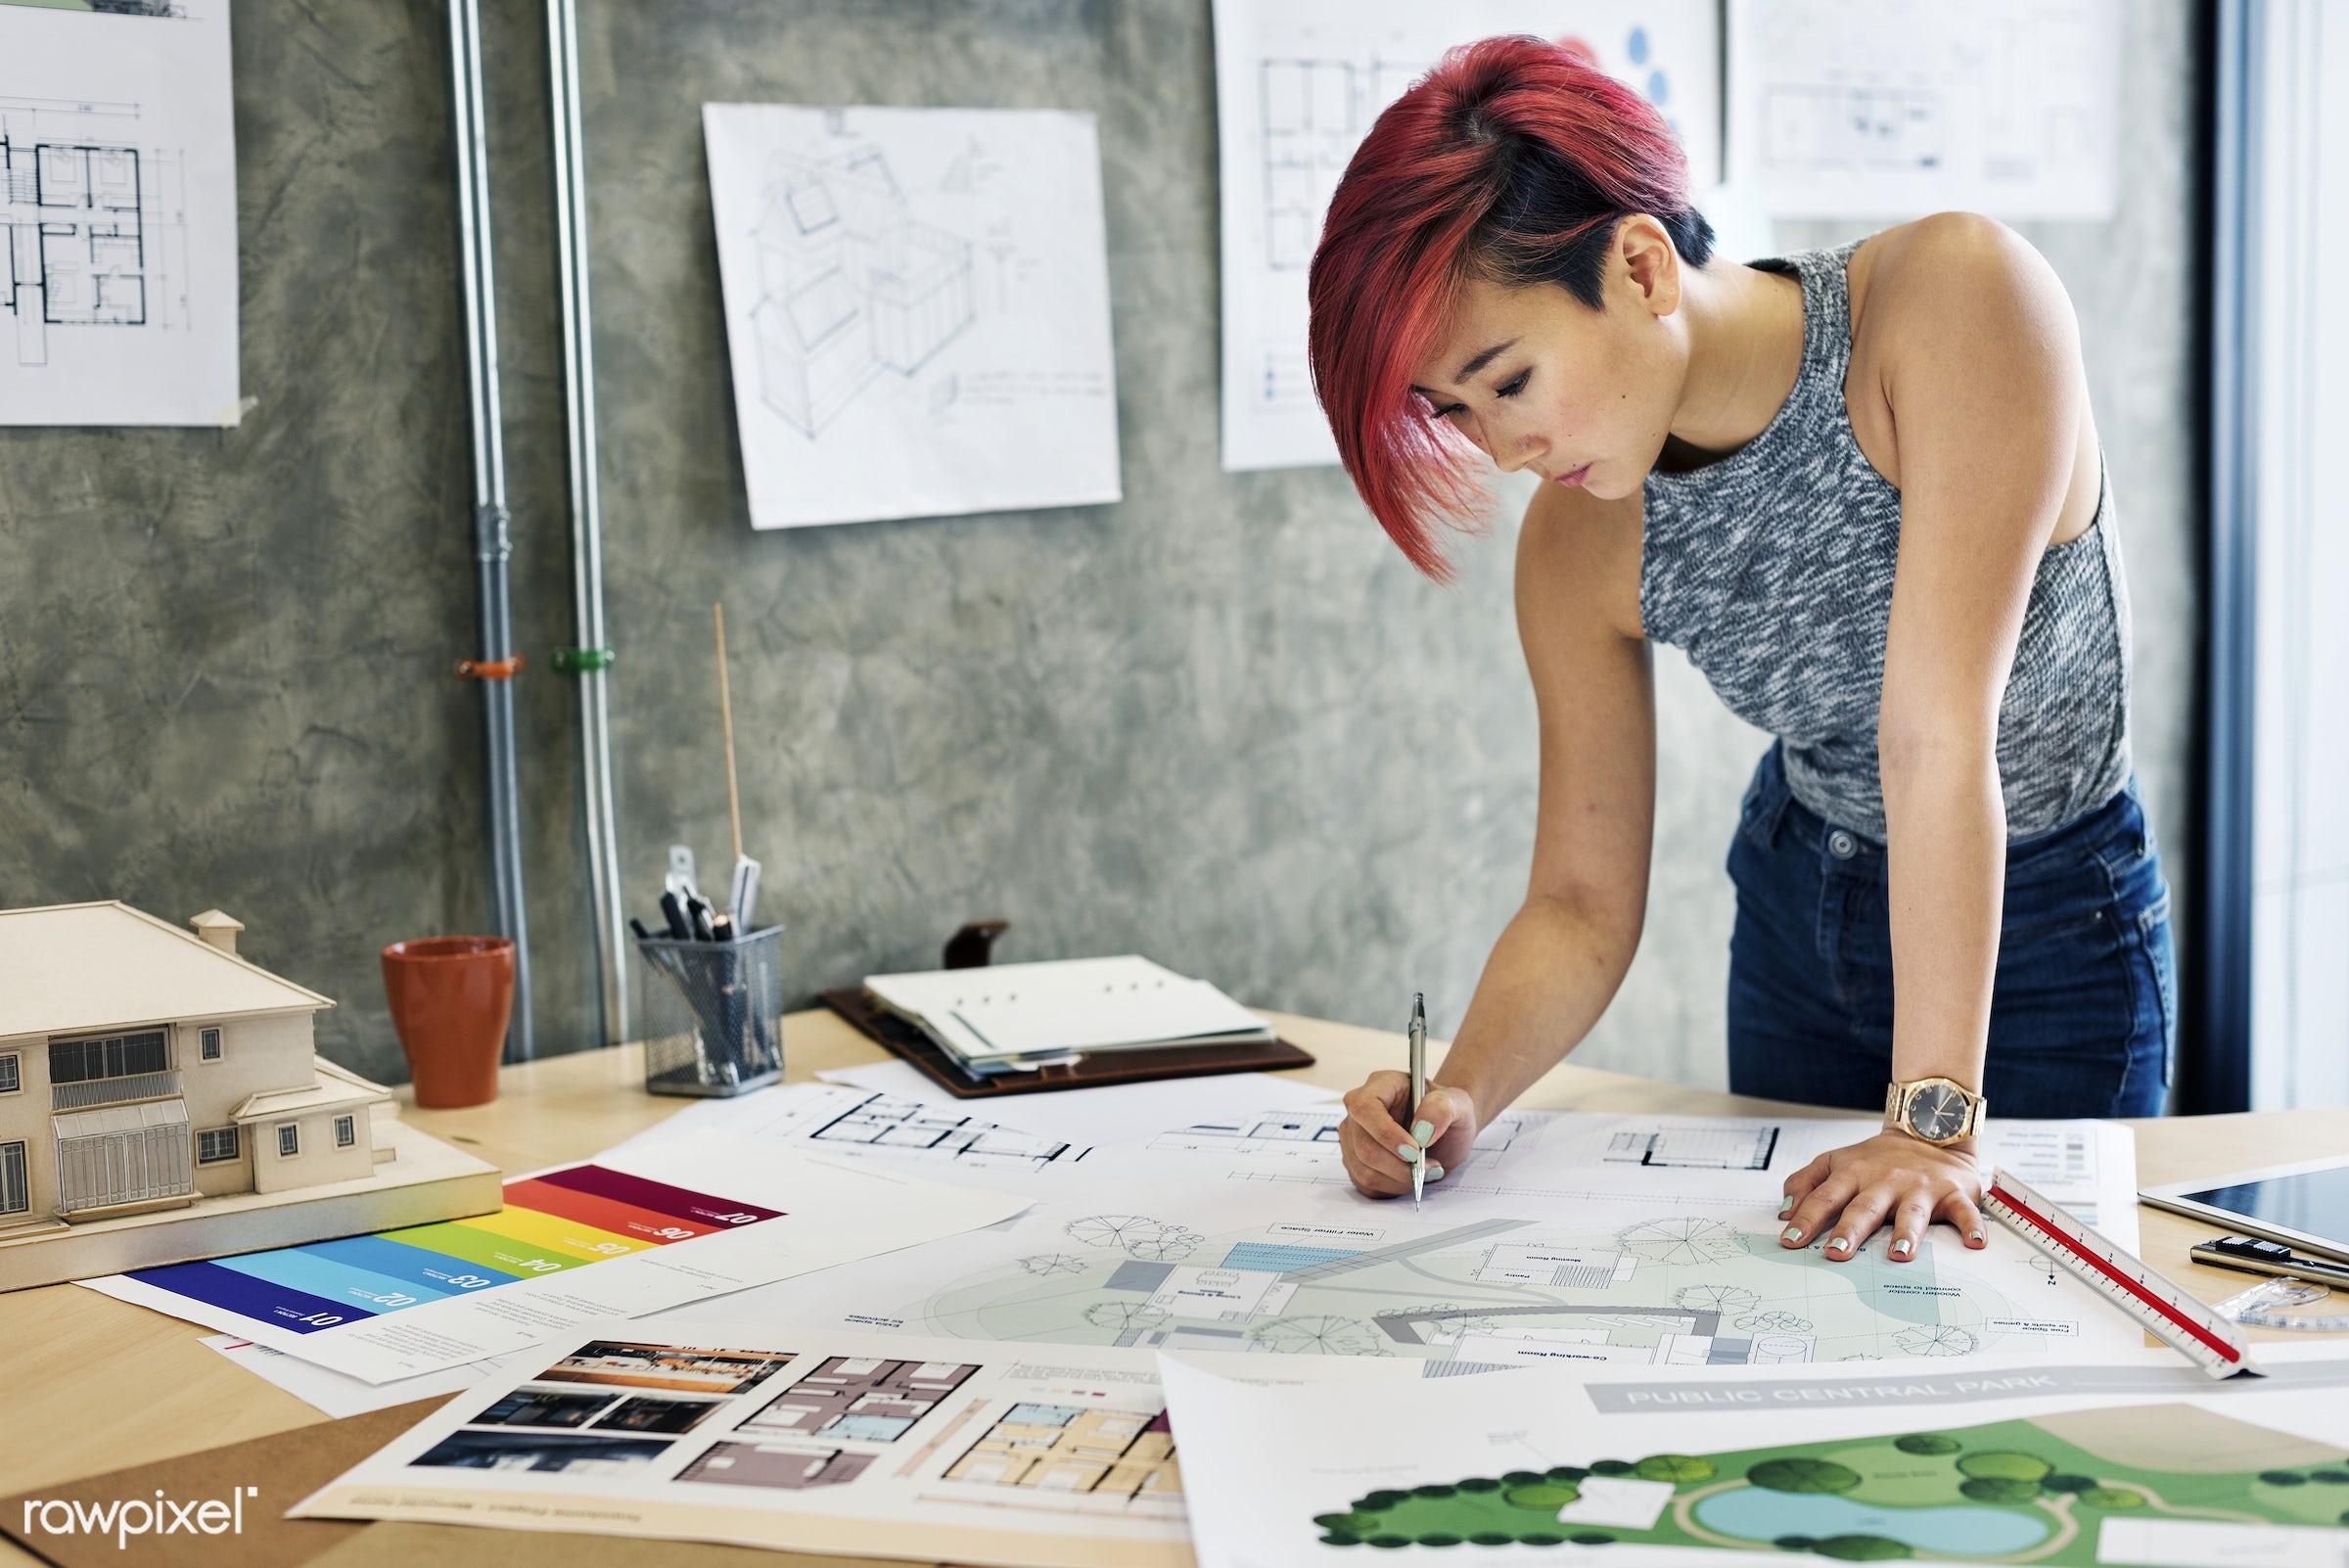 drawing, design, designer, model, office, workspace, architect, architecture, asian ethnicity, blueprint, brainstorming,...